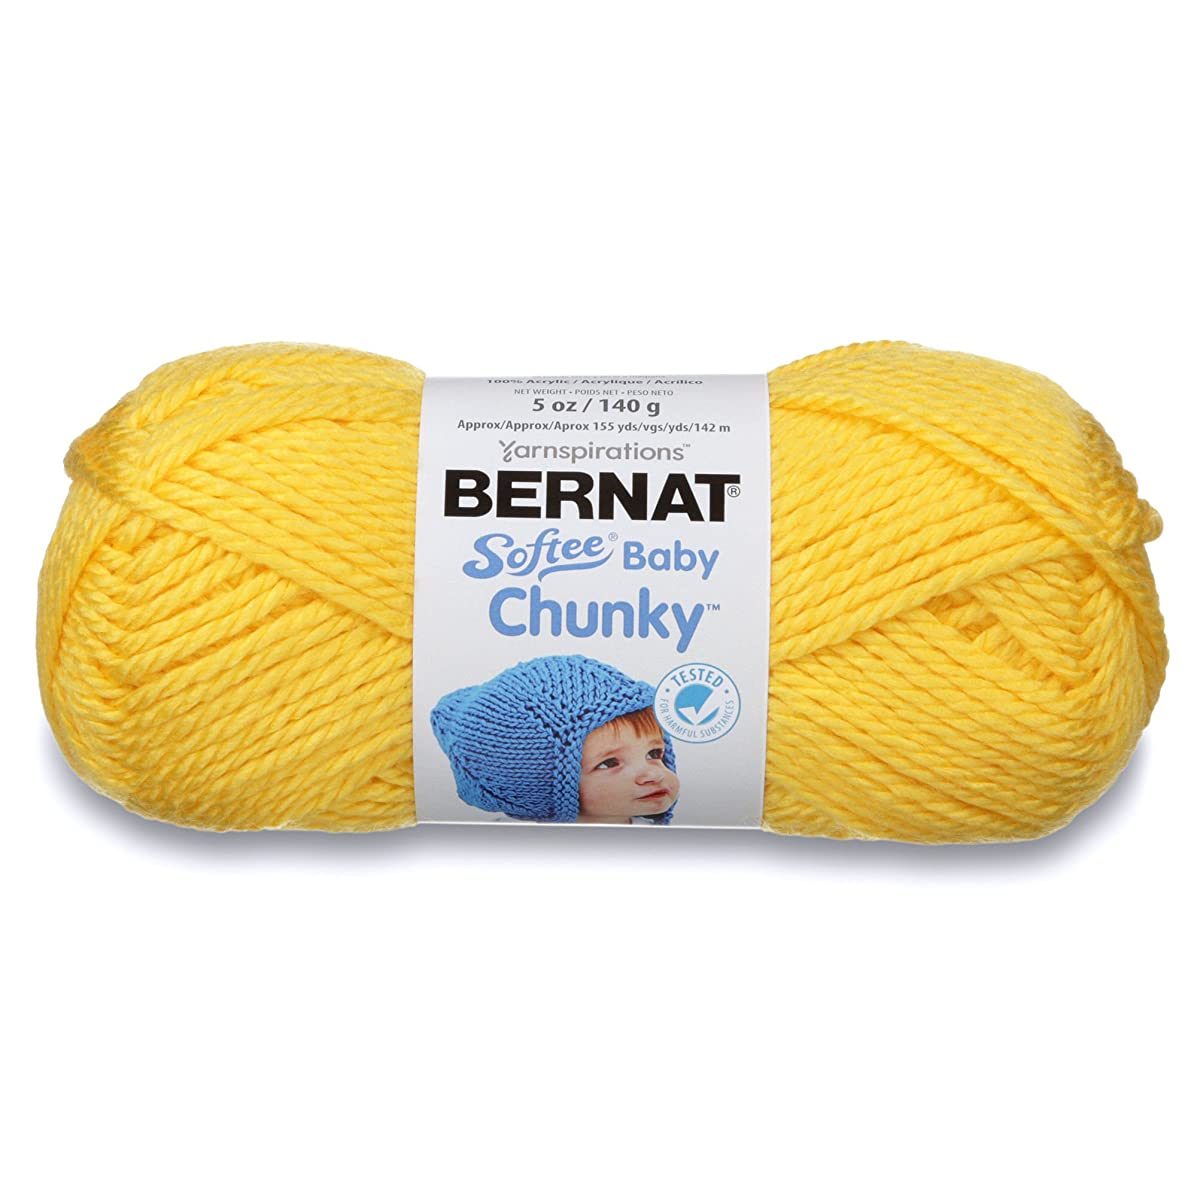 Bernat Softee Baby Chunky Yarn, Solid, 5 oz, Gauge 5 Bulky Chunky, Buttercup